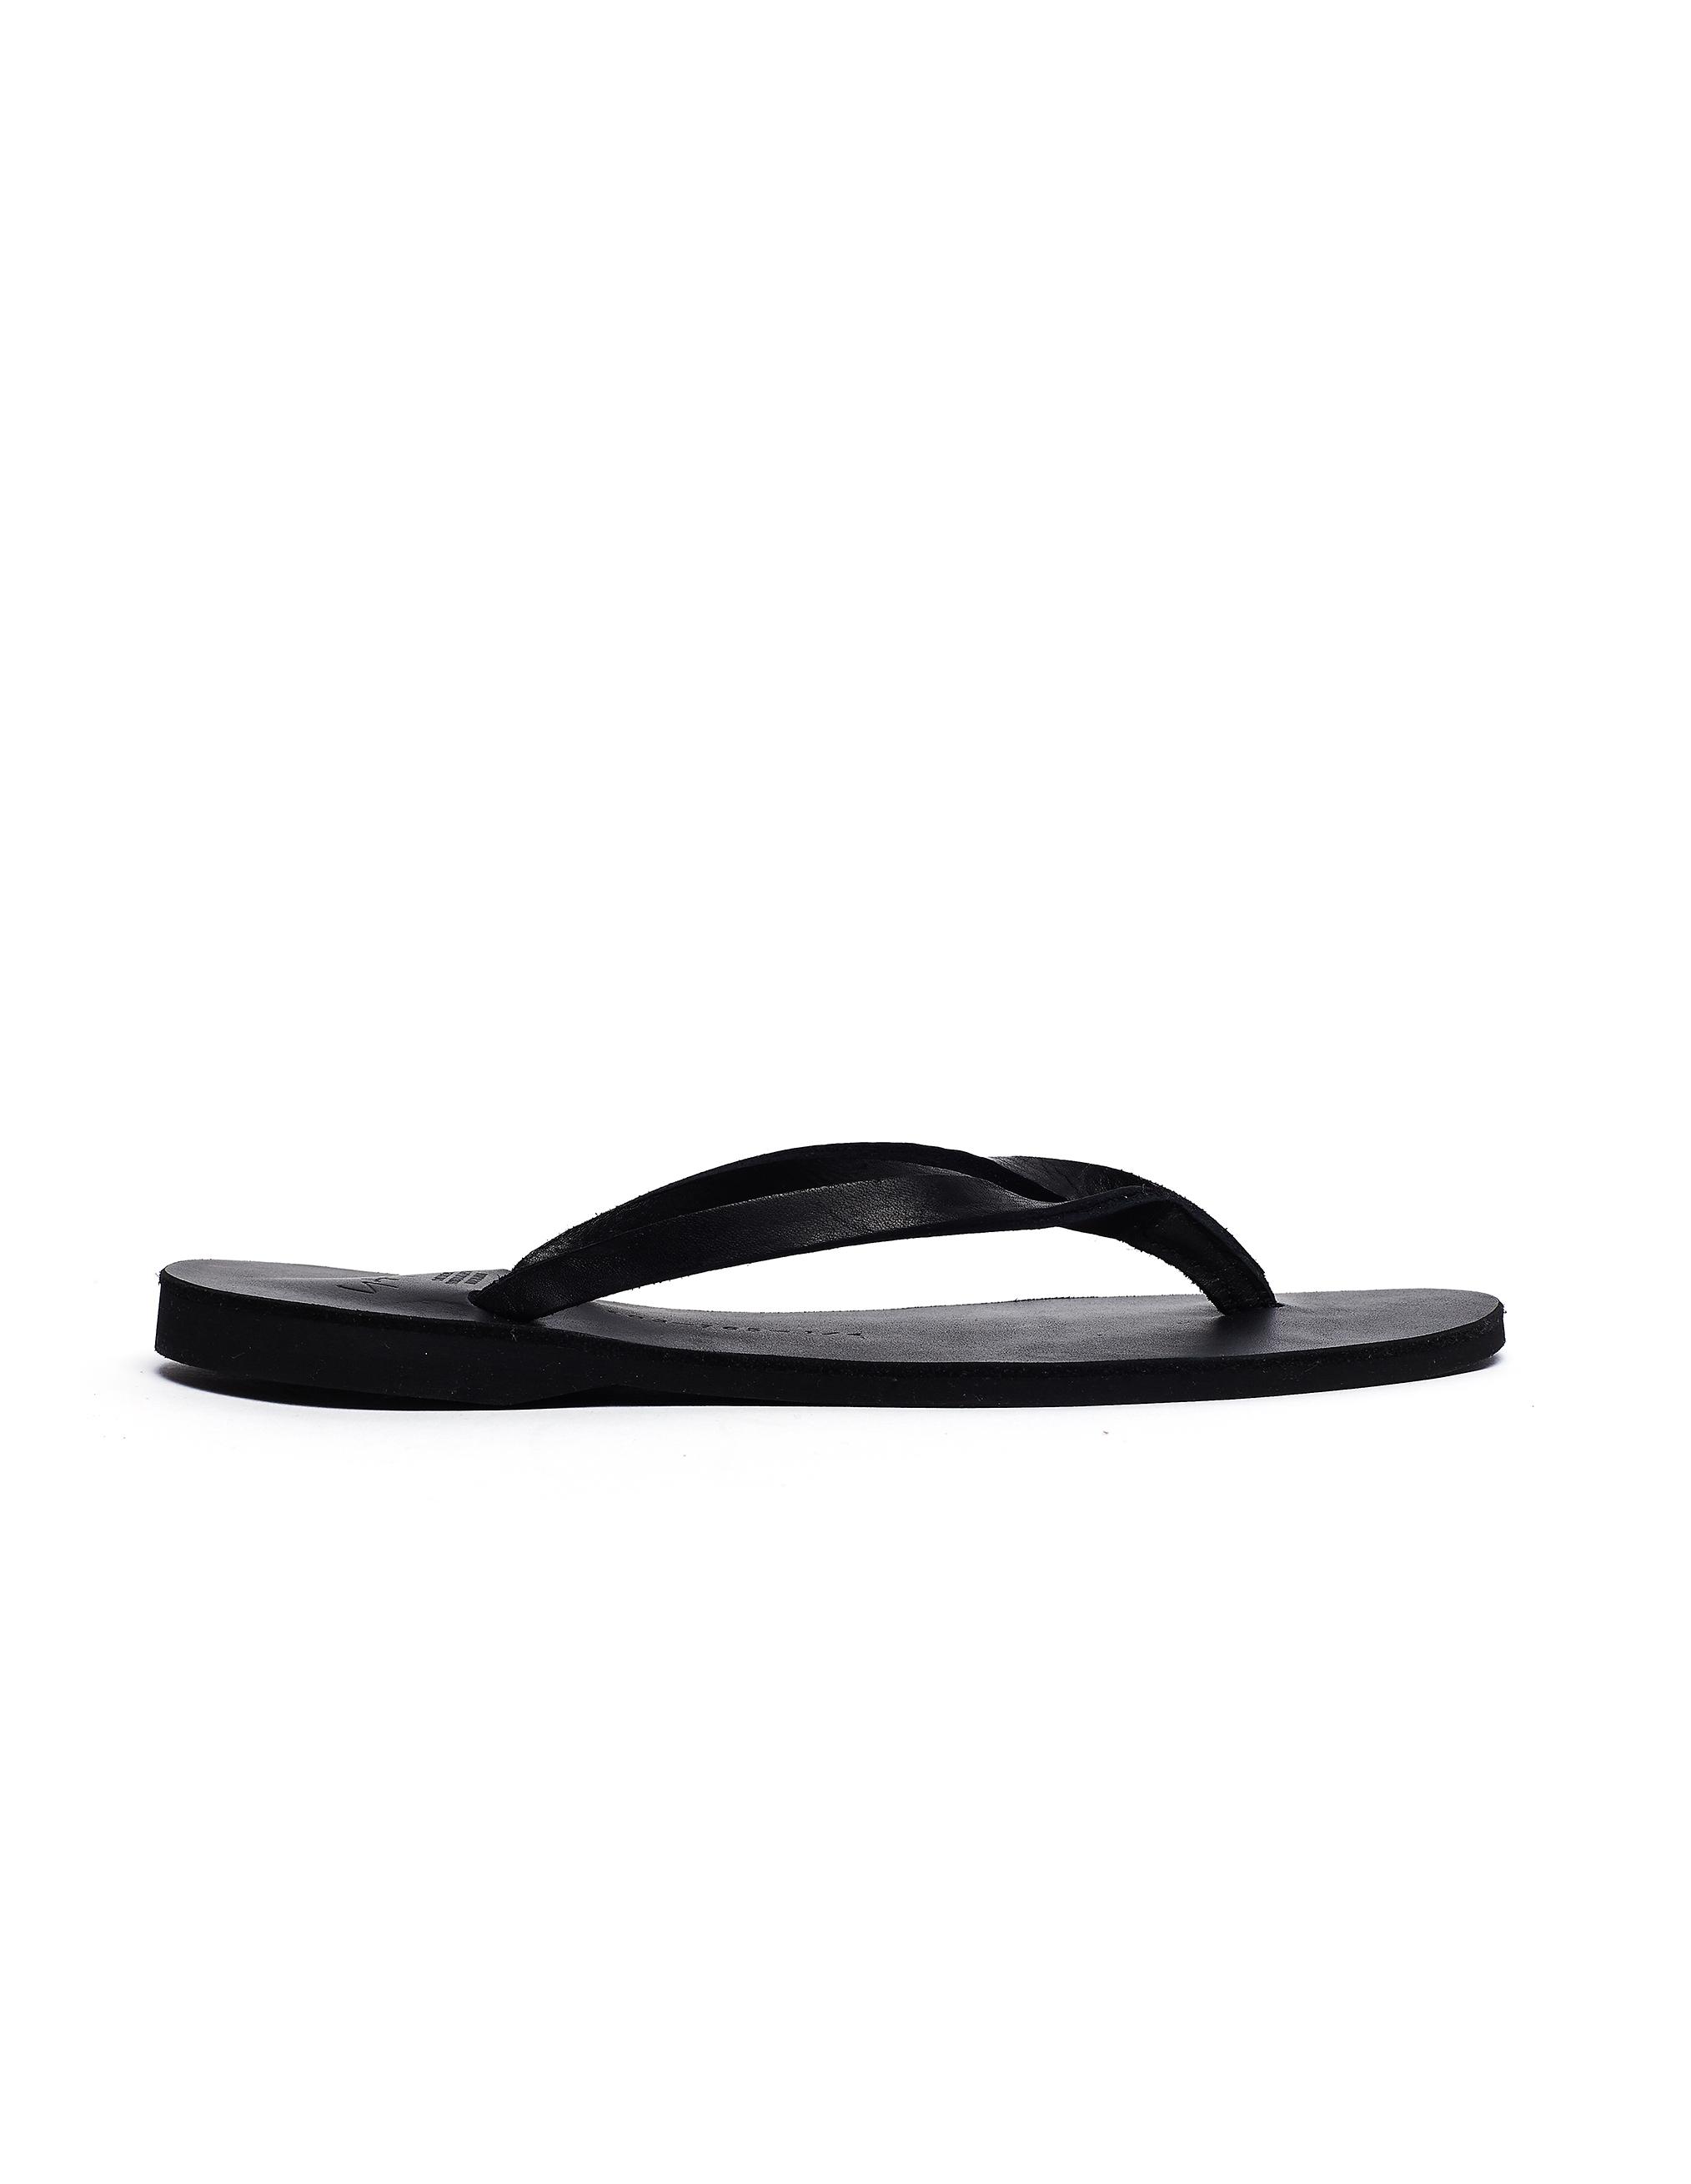 Yohji Yamamoto Black Leather Flip-Flops